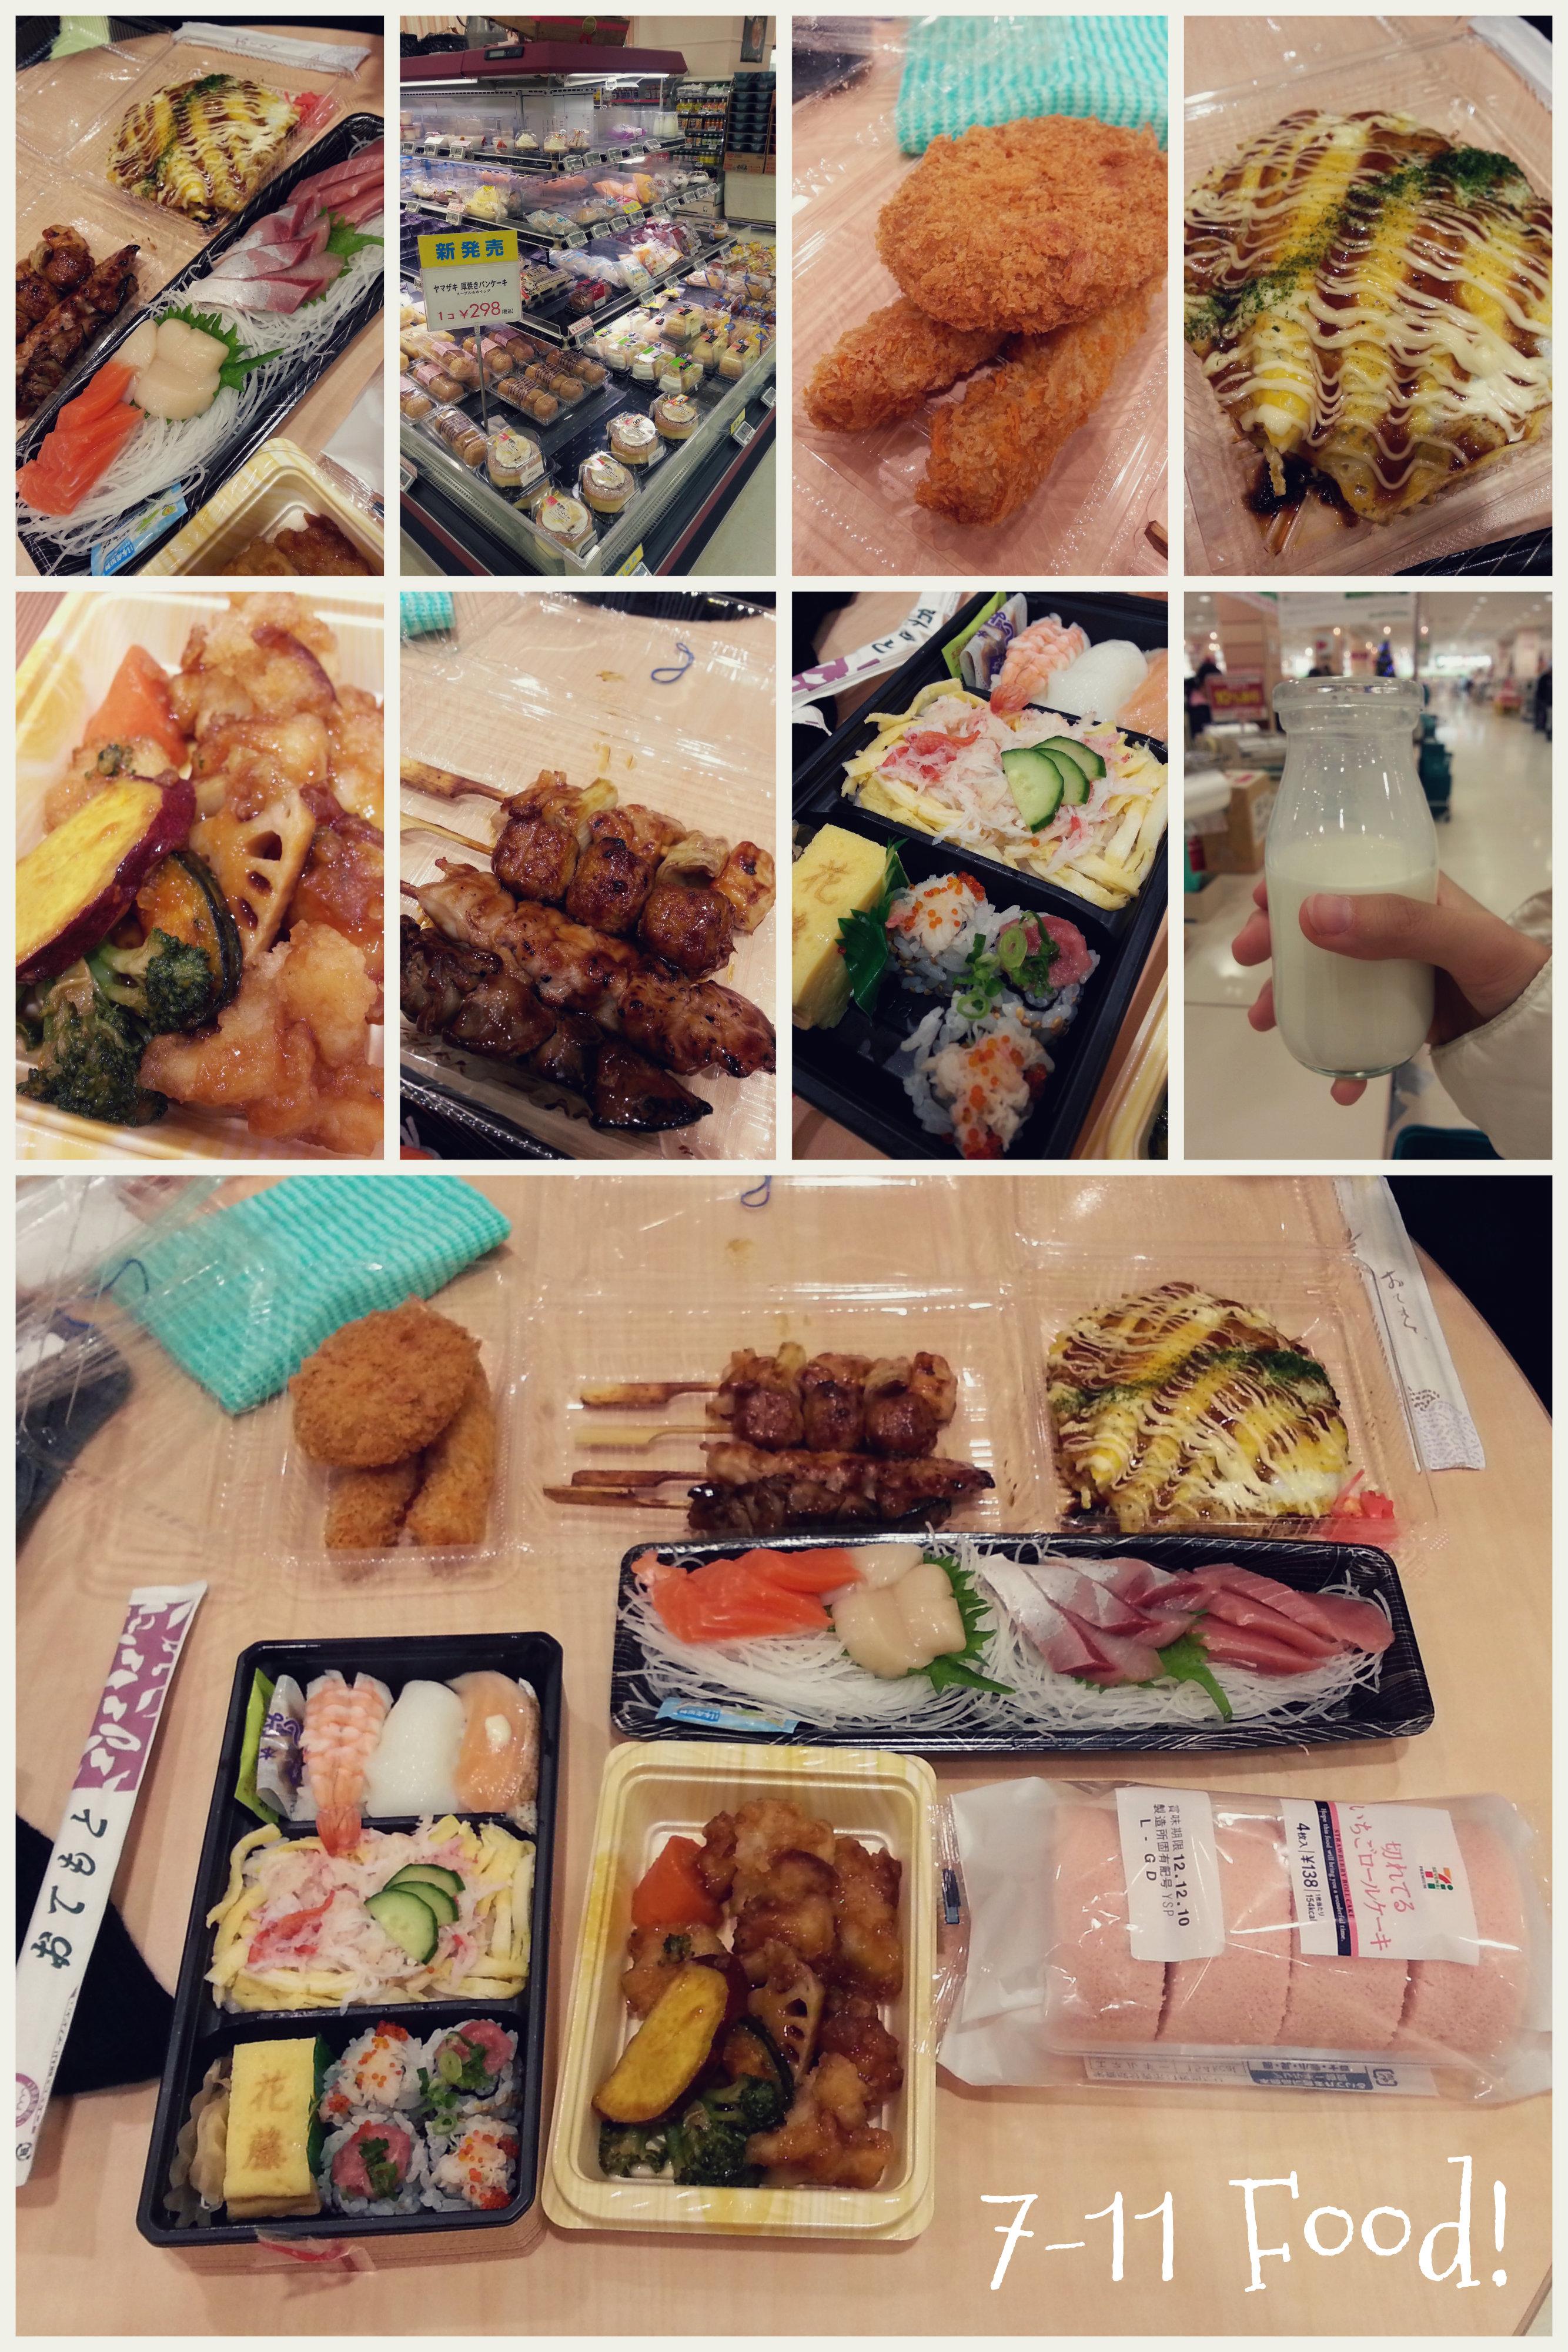 sapporo 711 food